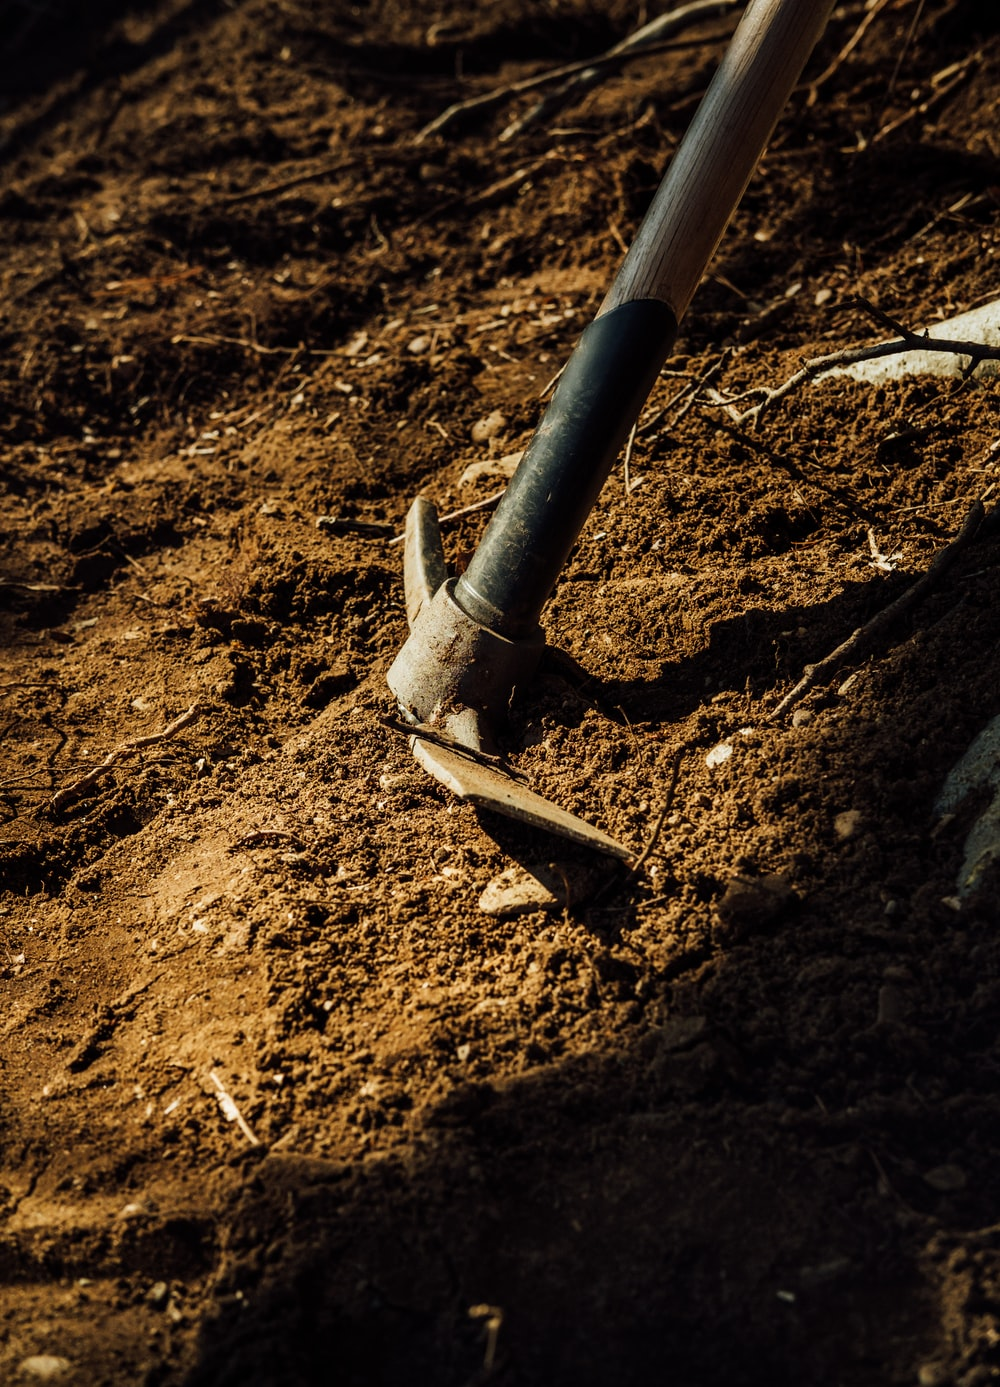 gray metal pipe on brown soil